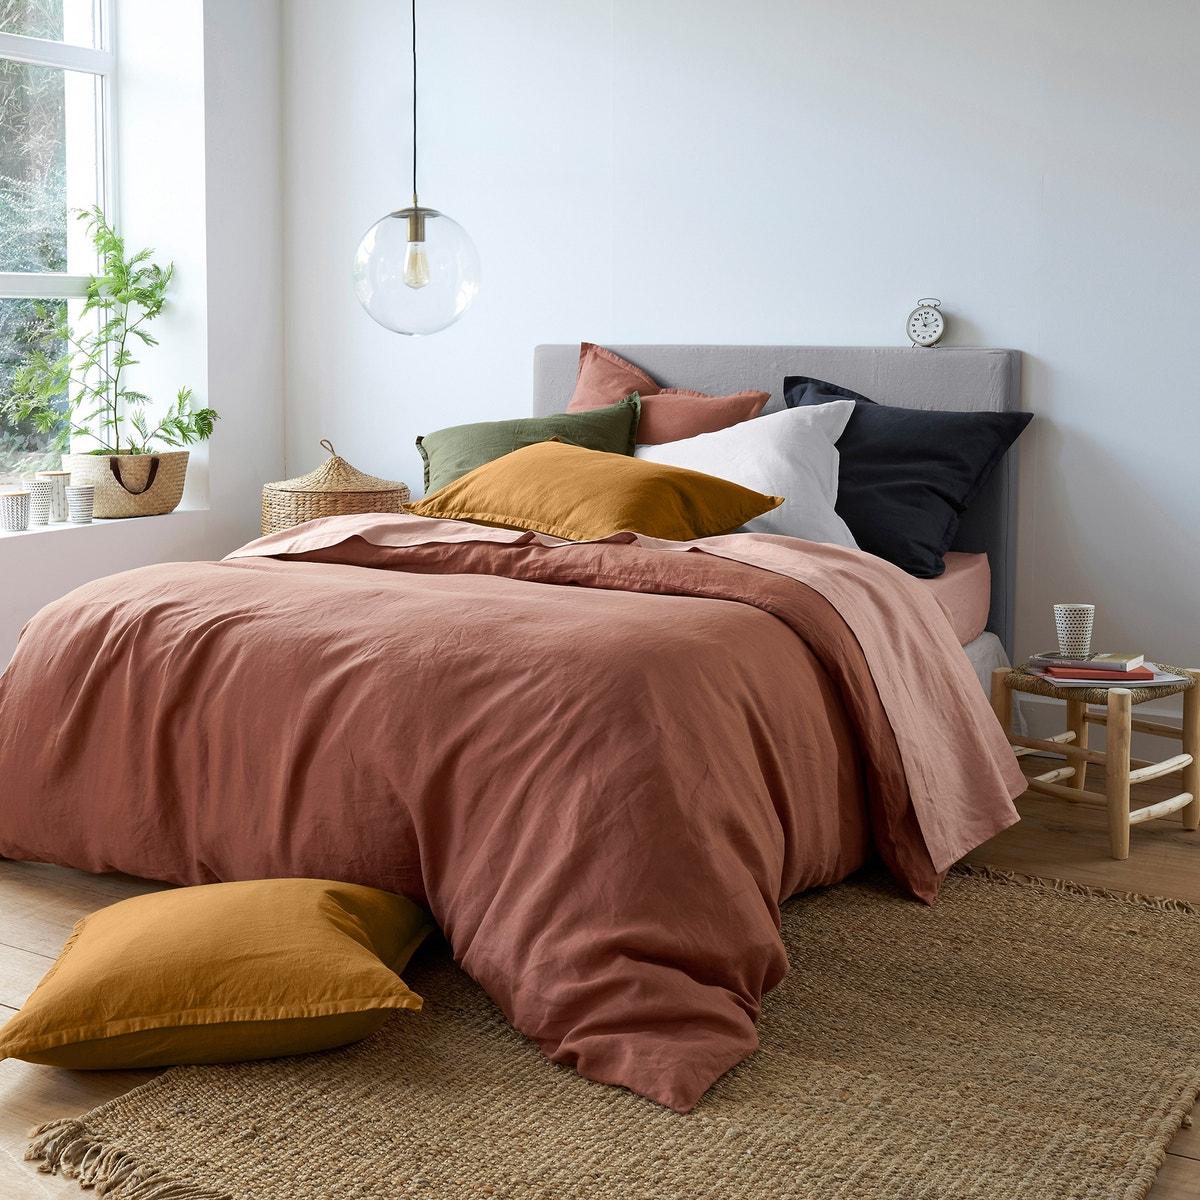 Sypialnia mocna kolorem